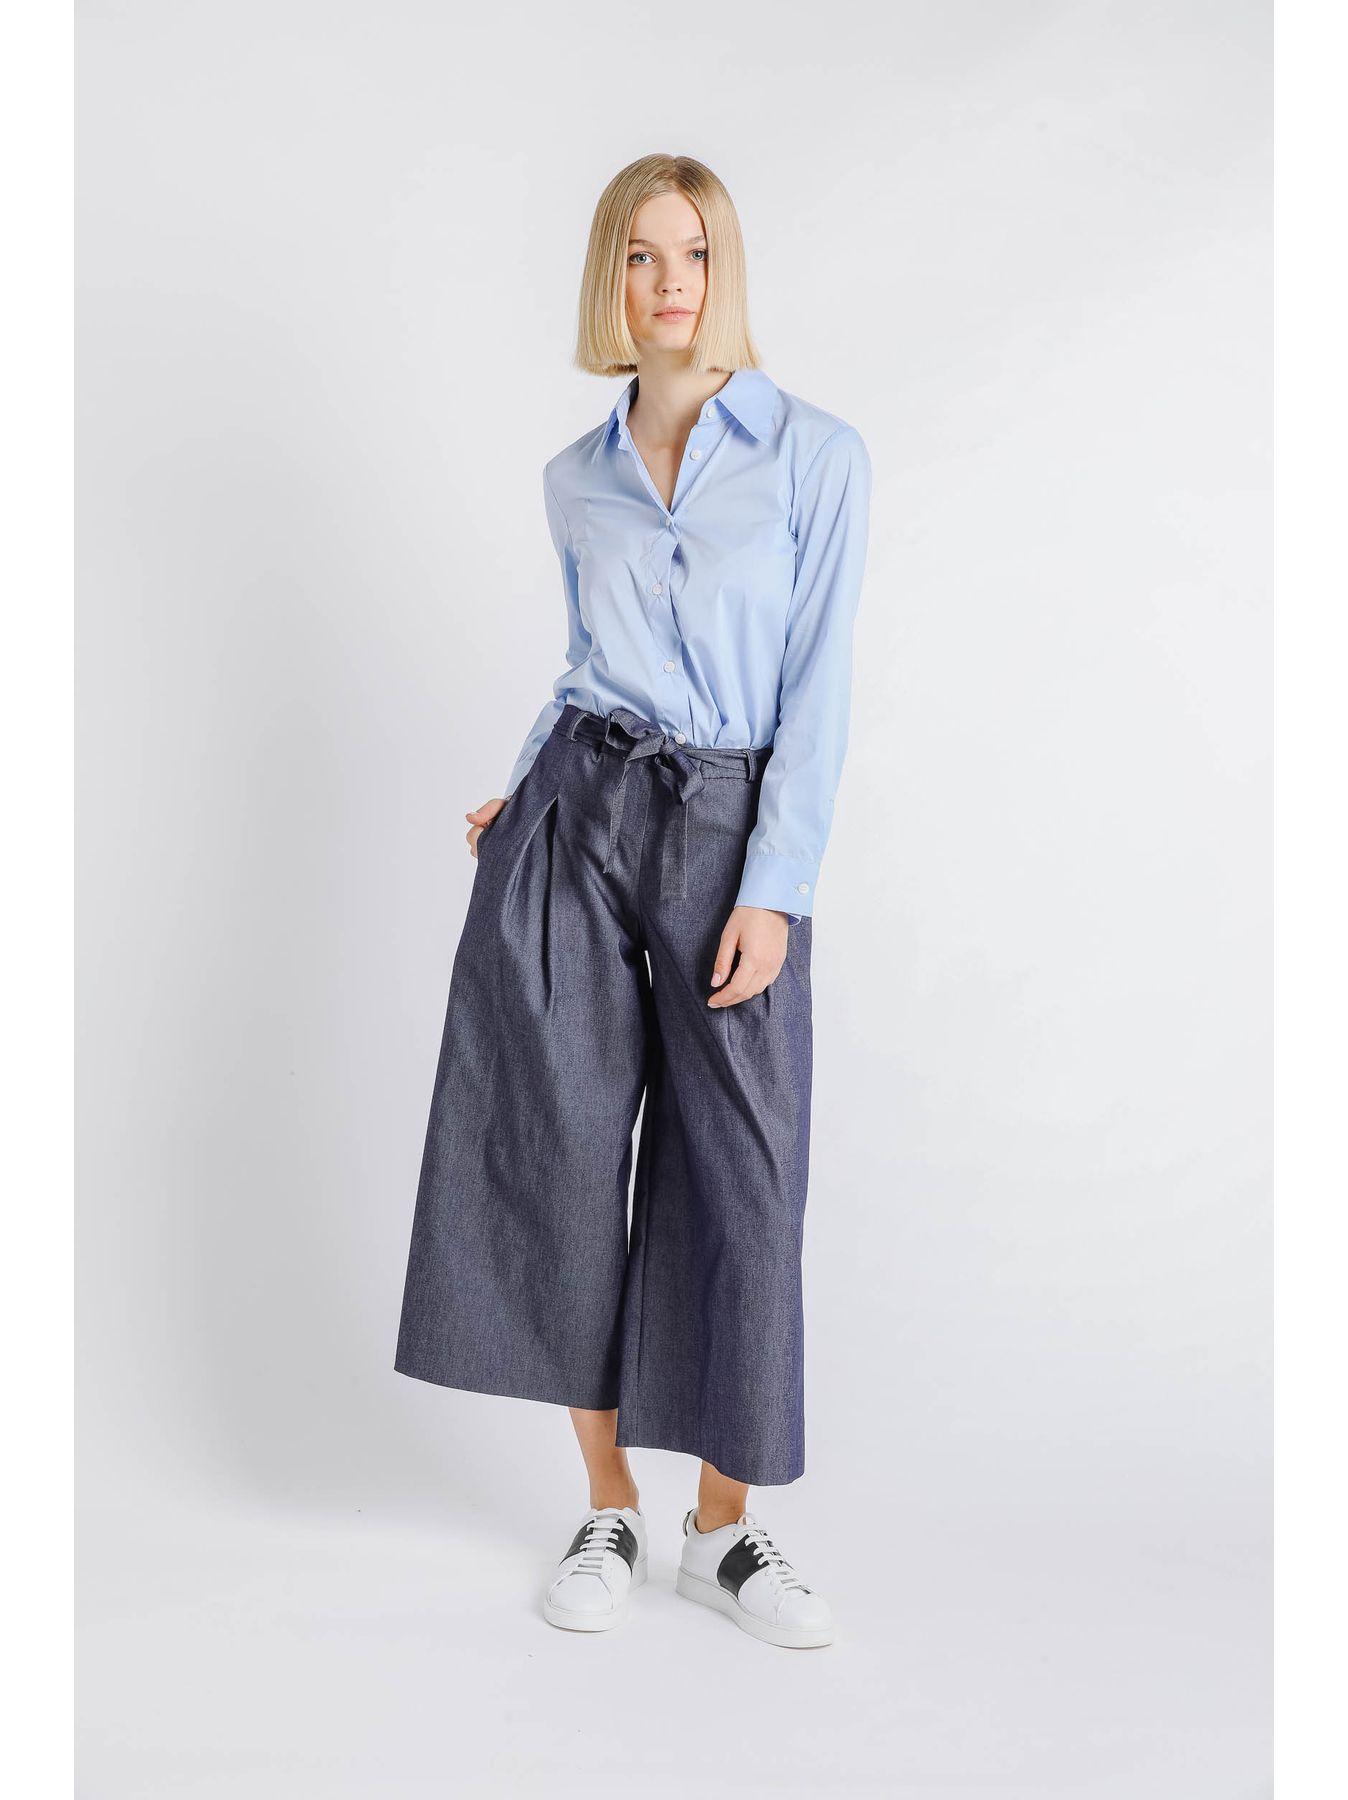 Pantalone pinces in denim